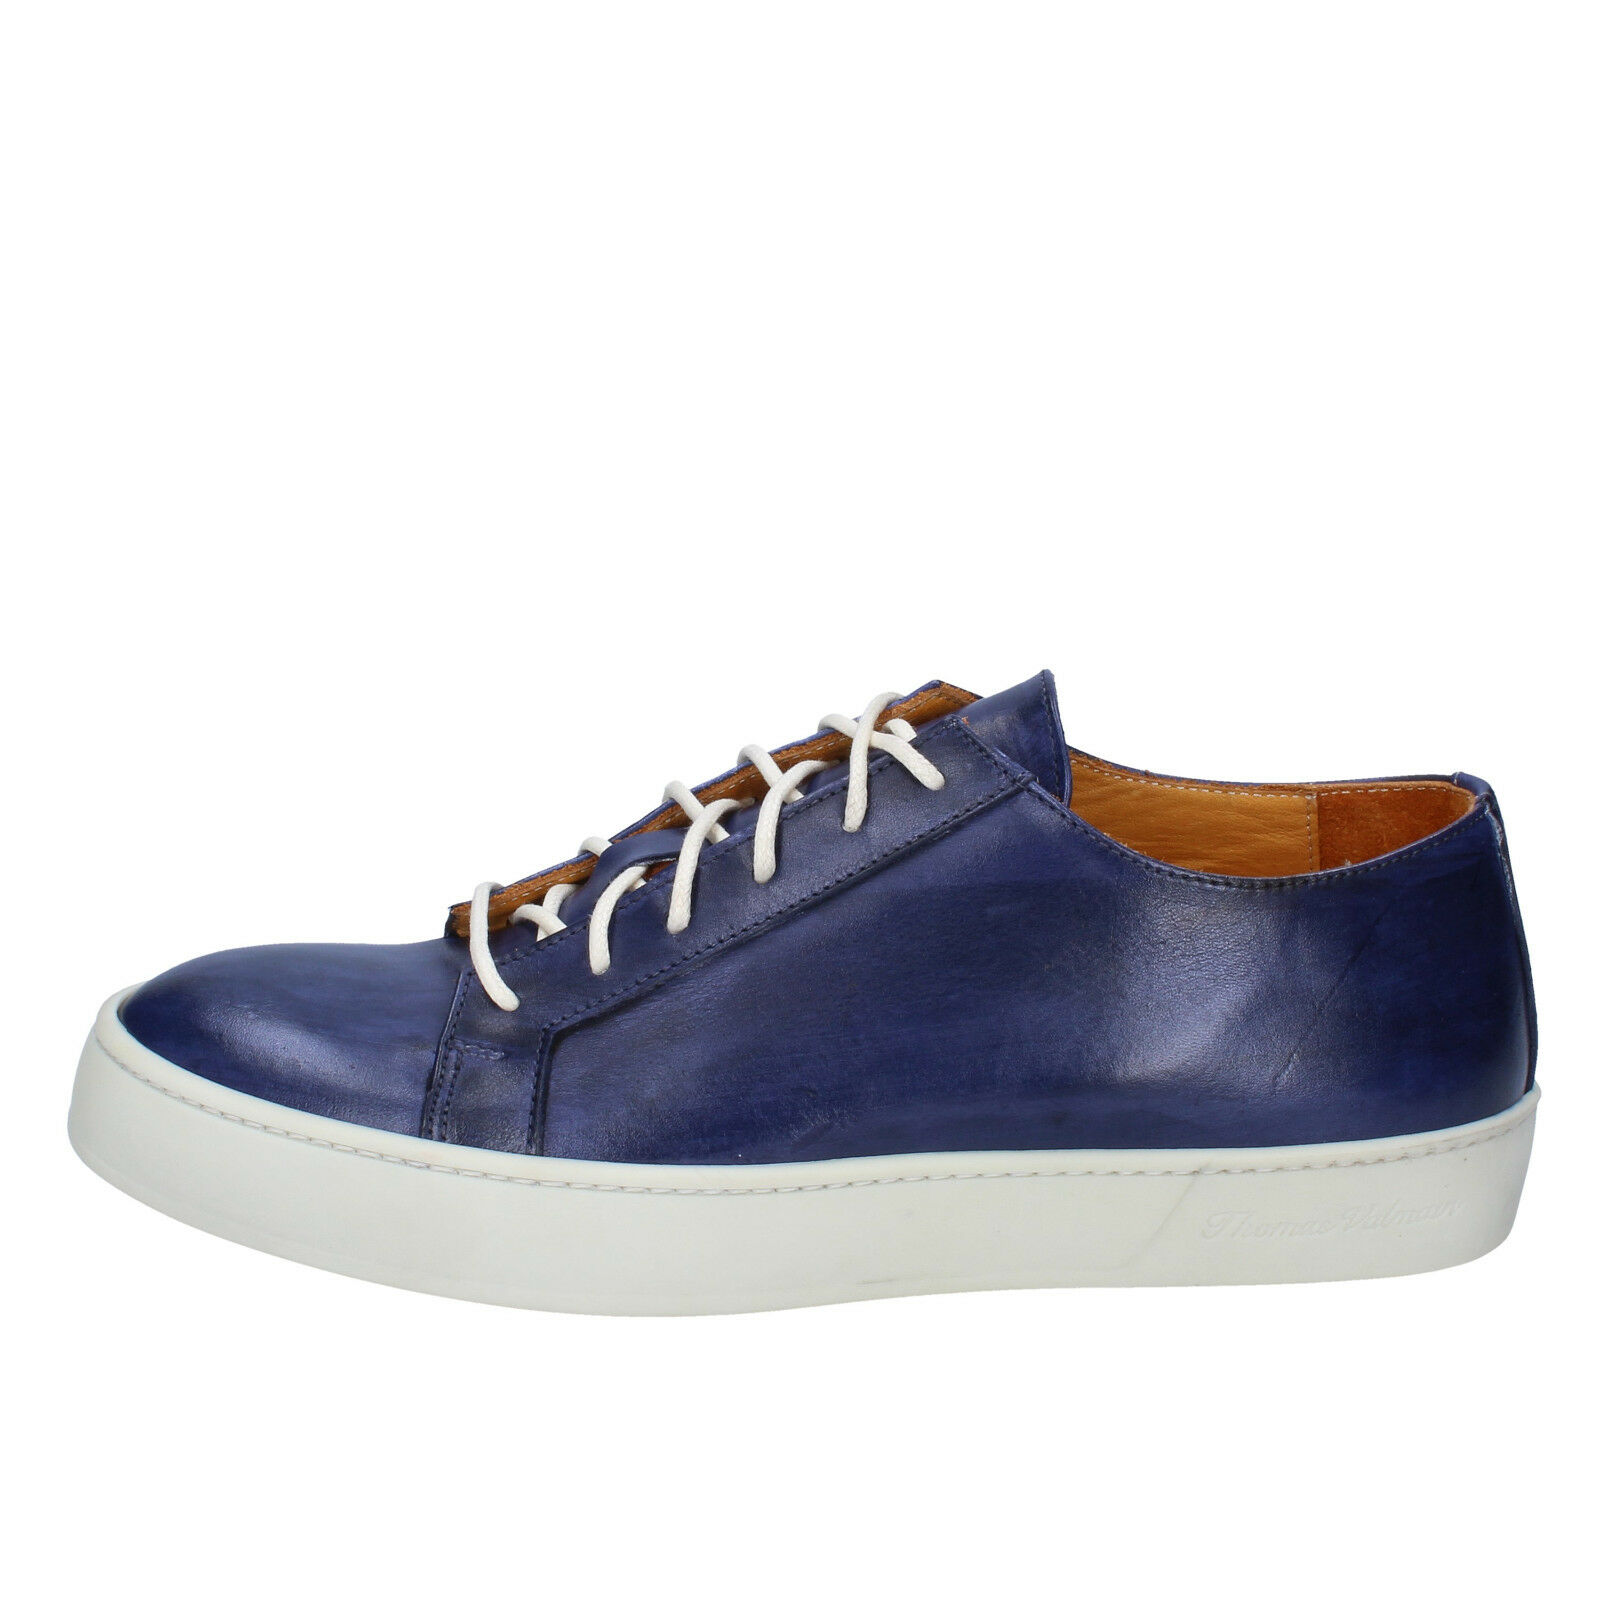 Scarpe uomo THOMAS VALMAIN 41 scarpe da da da ginnastica blu pelle AB806-C 3ca4eb